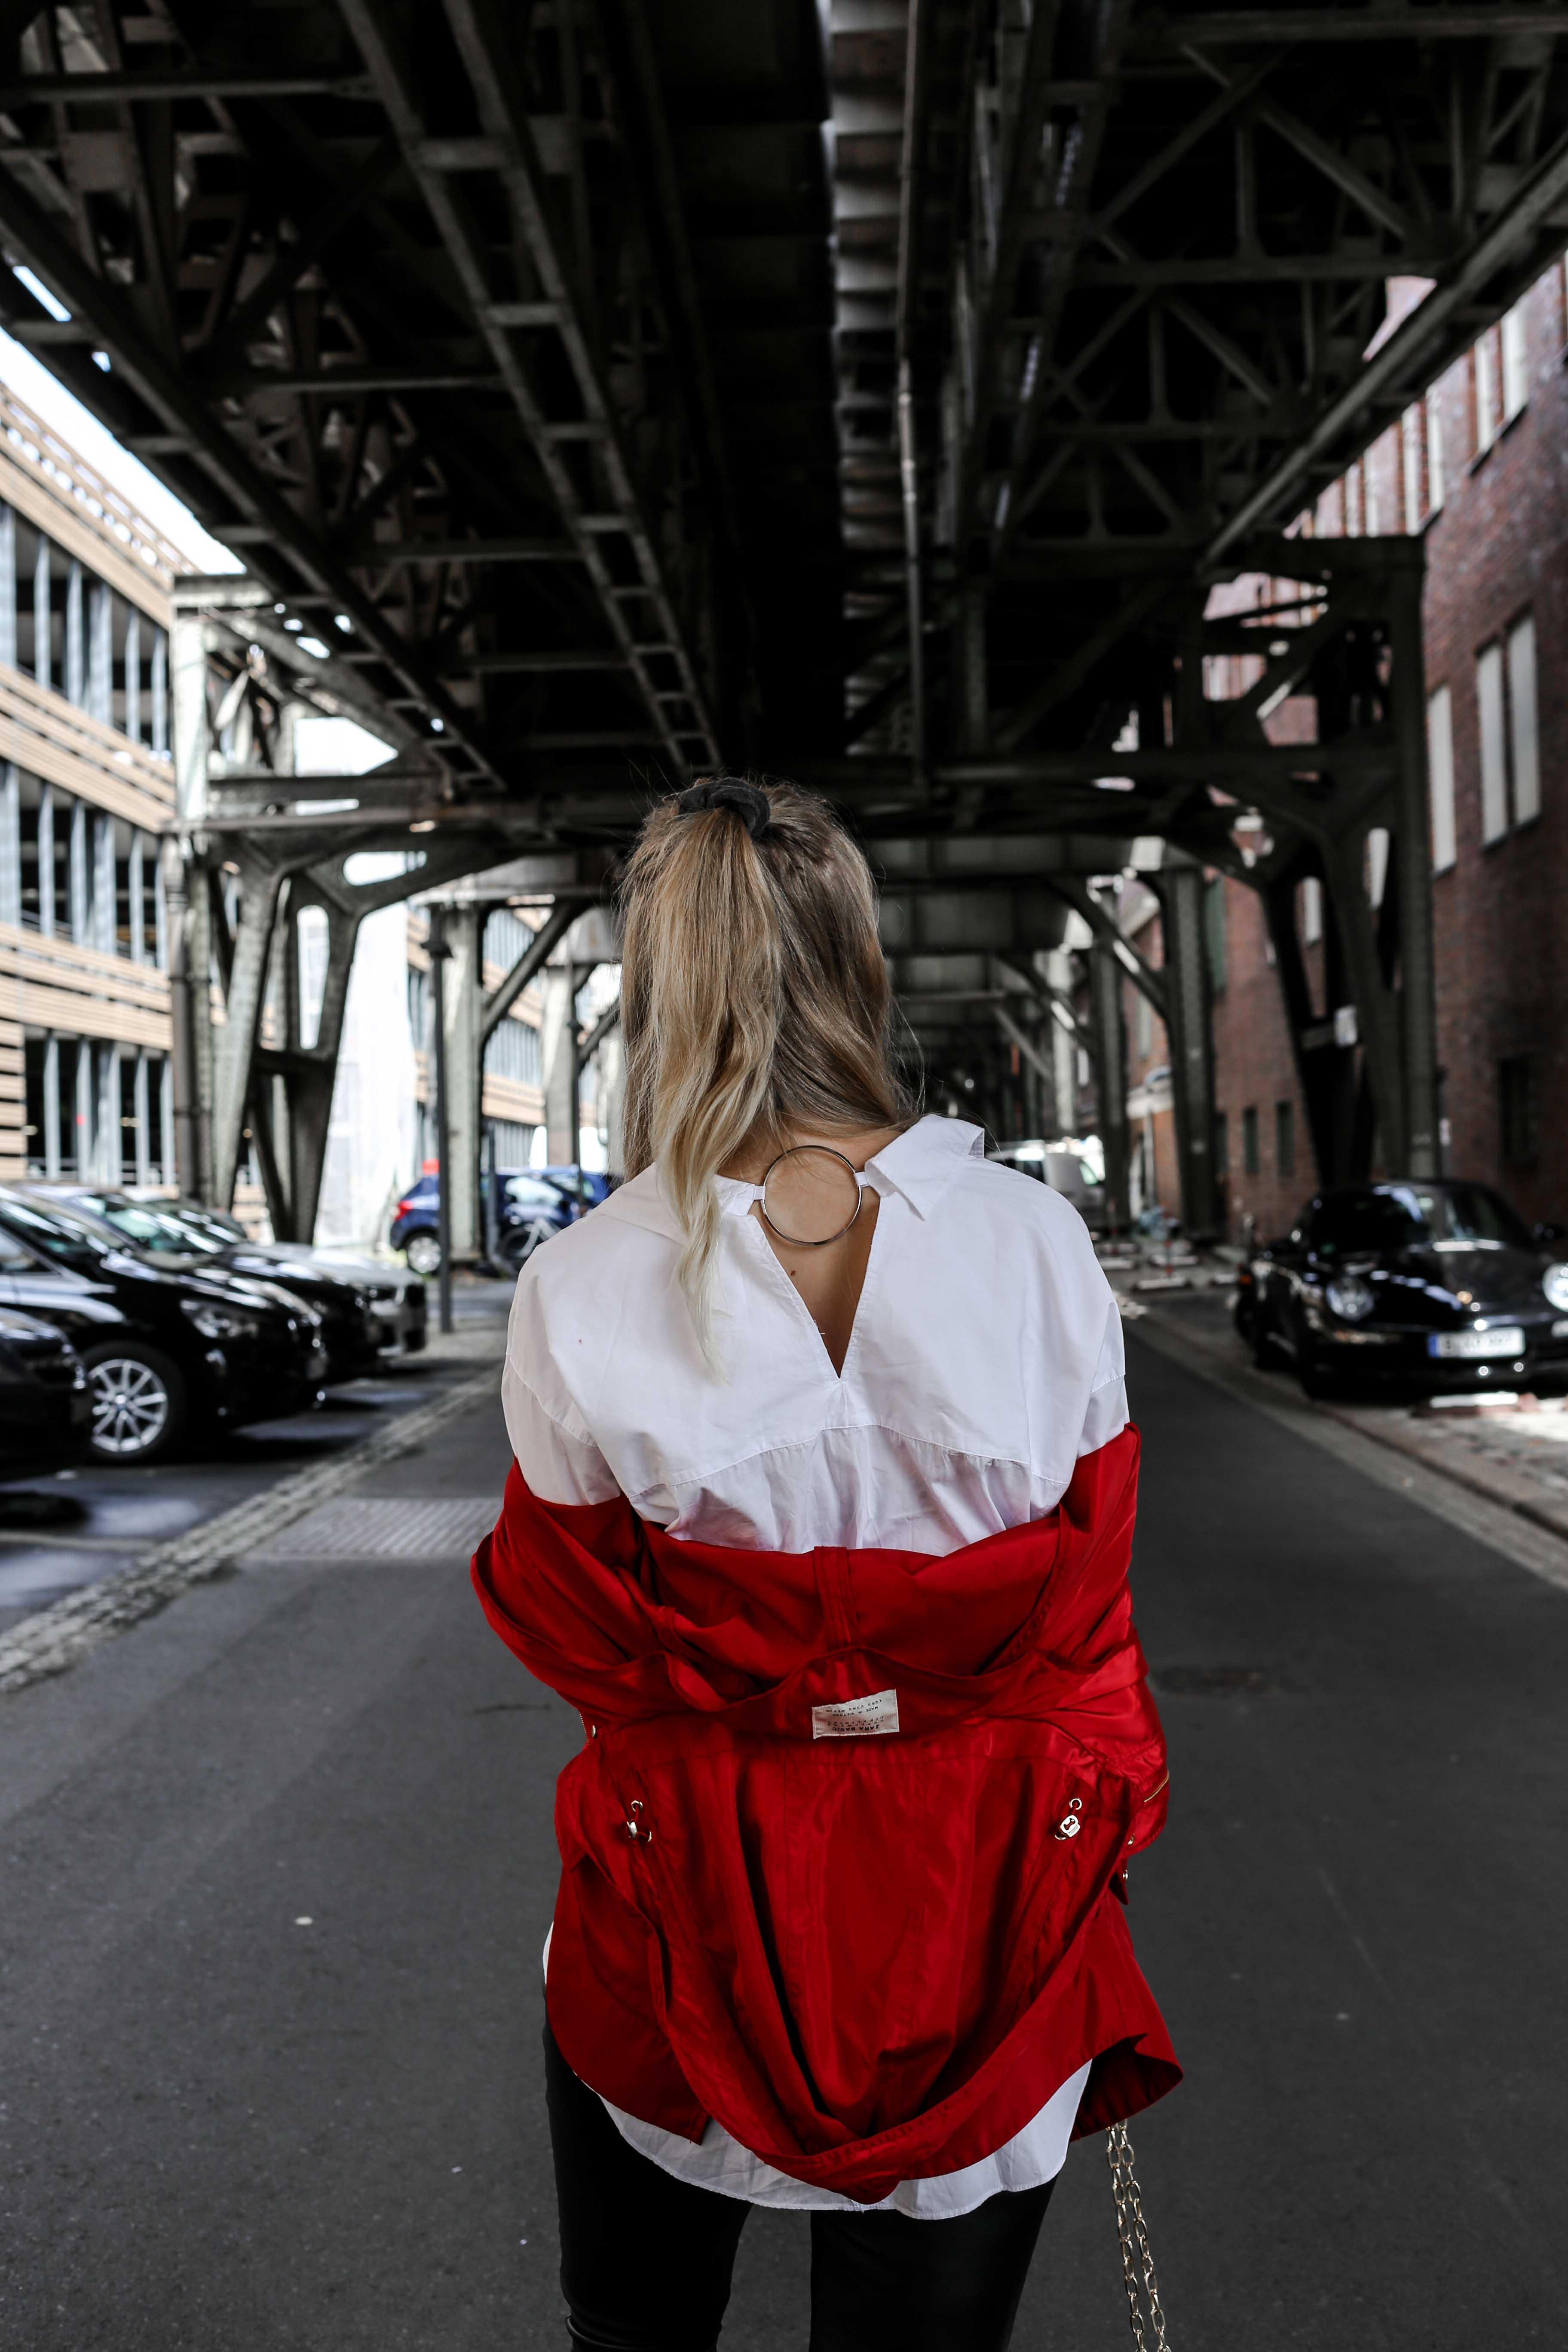 fashion-week-look-rote-regenjacke-grunge-outfit-berlin-modeblog-fashionblog_9335